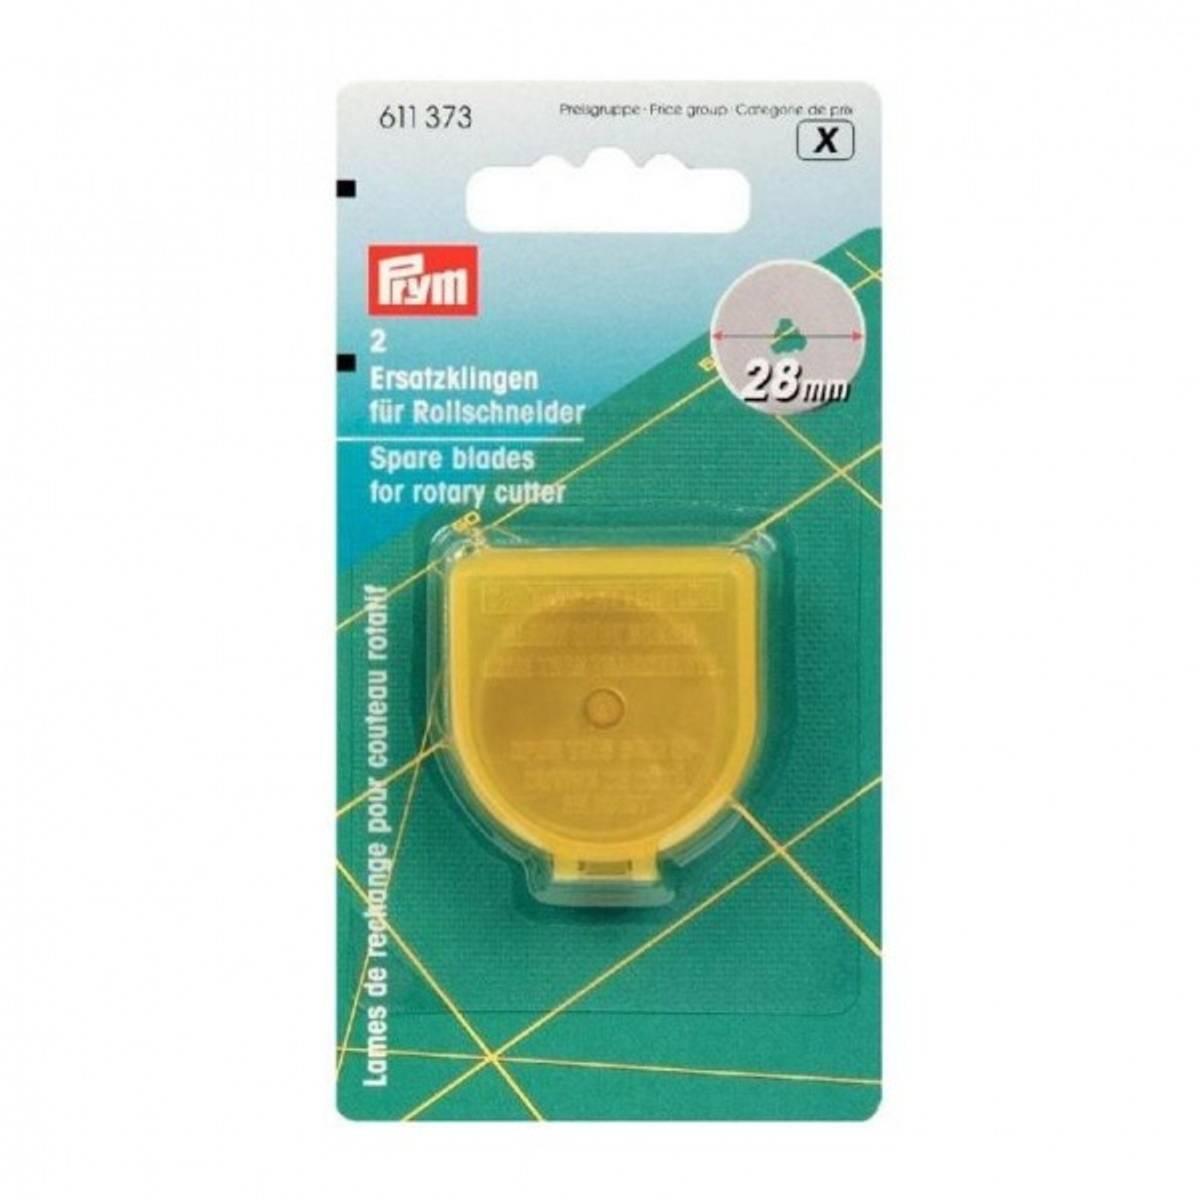 PRYM ekstra blad rullekniv 28 mm 2pakk 611373